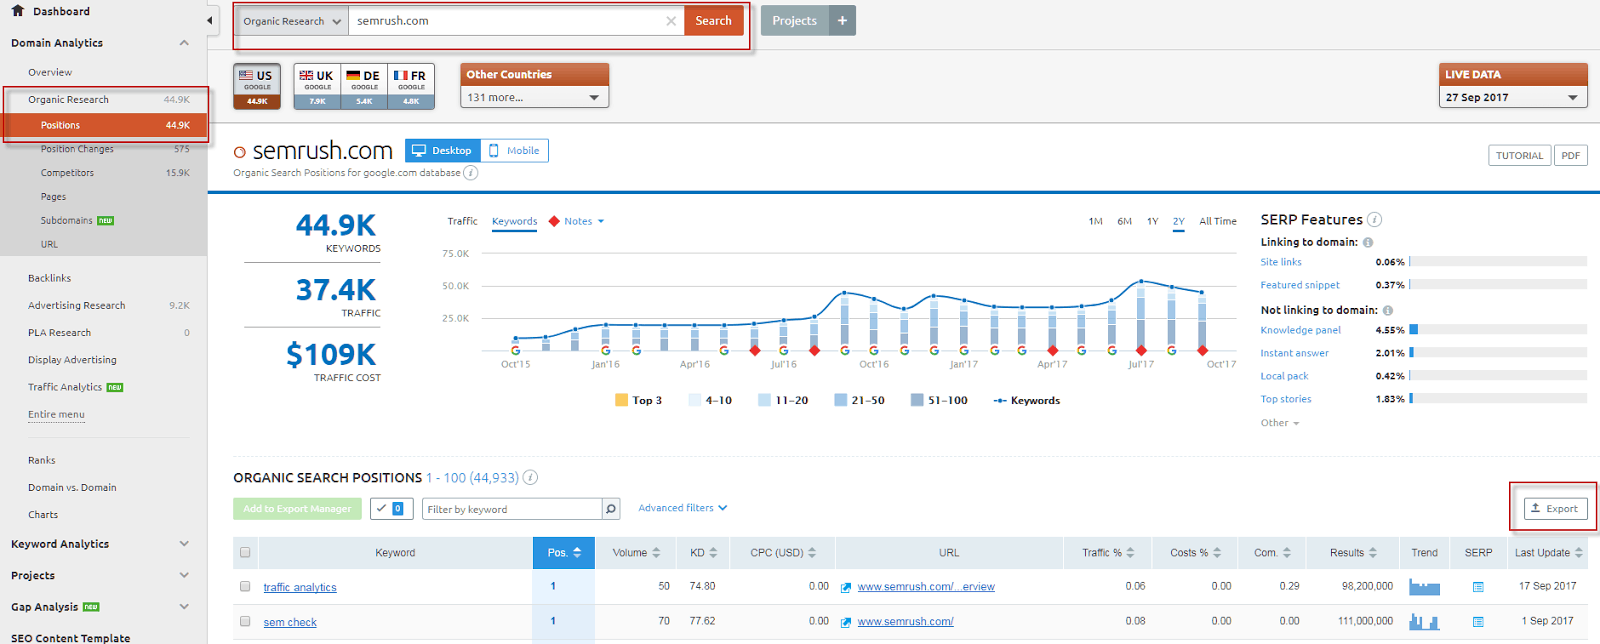 SEMRush competitors keywords Analysis